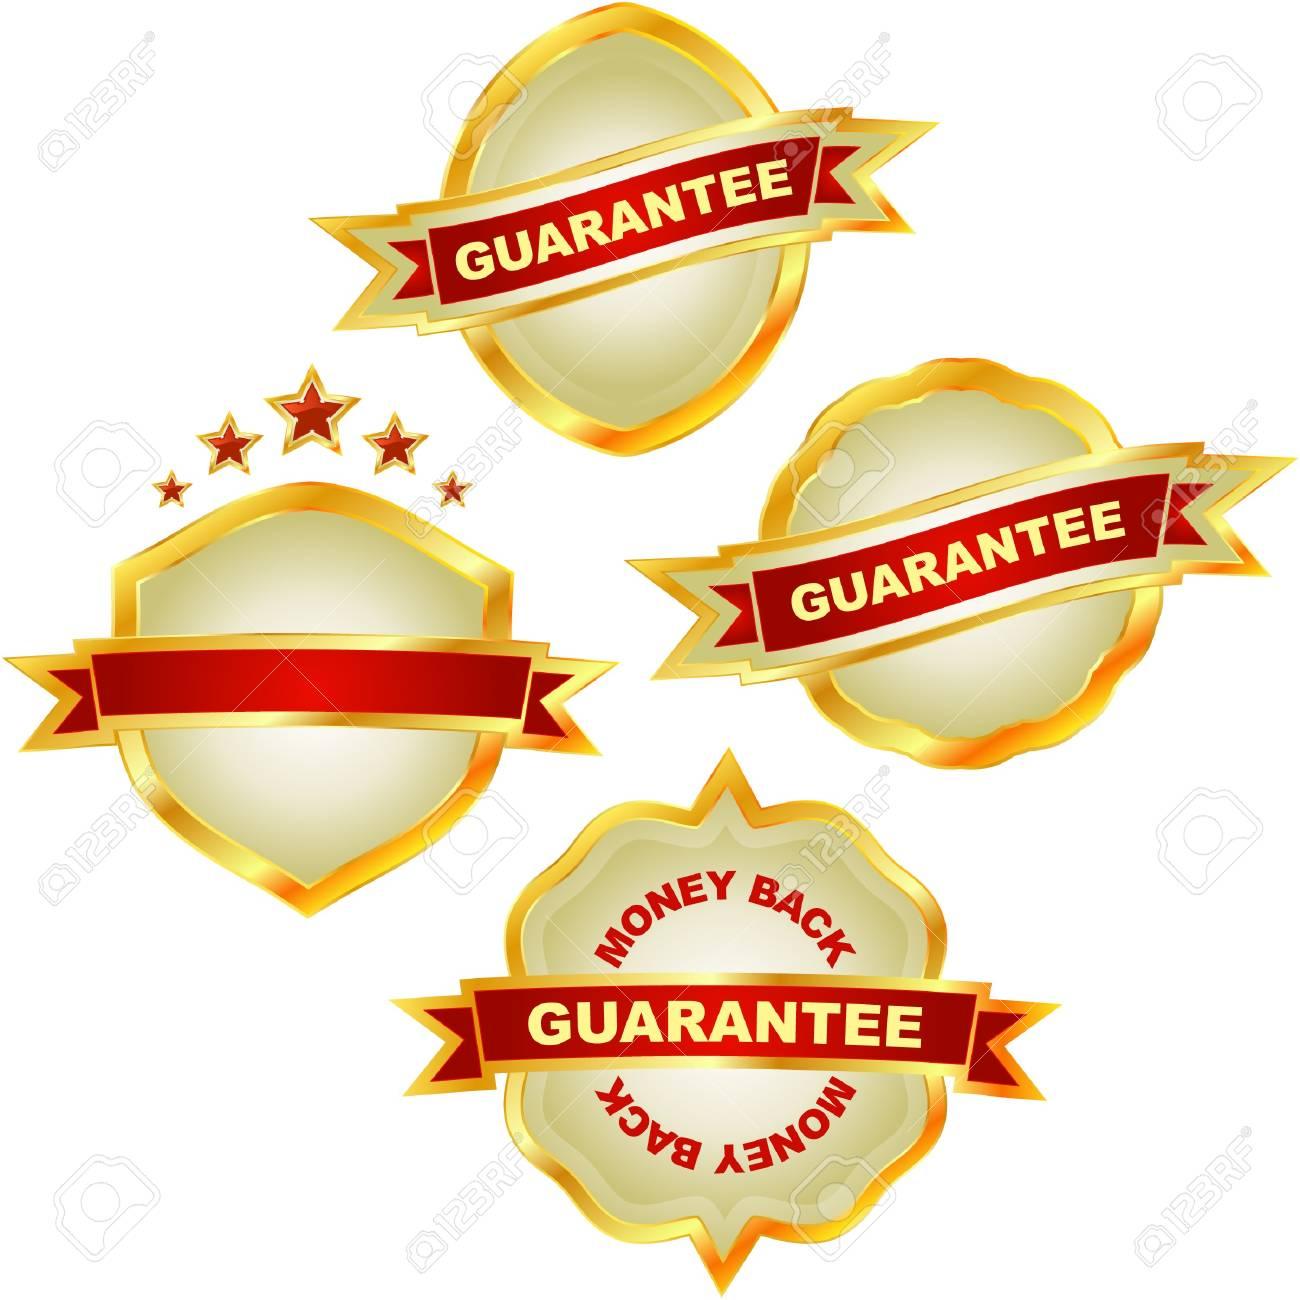 Guarantee label set. Stock Vector - 7800512